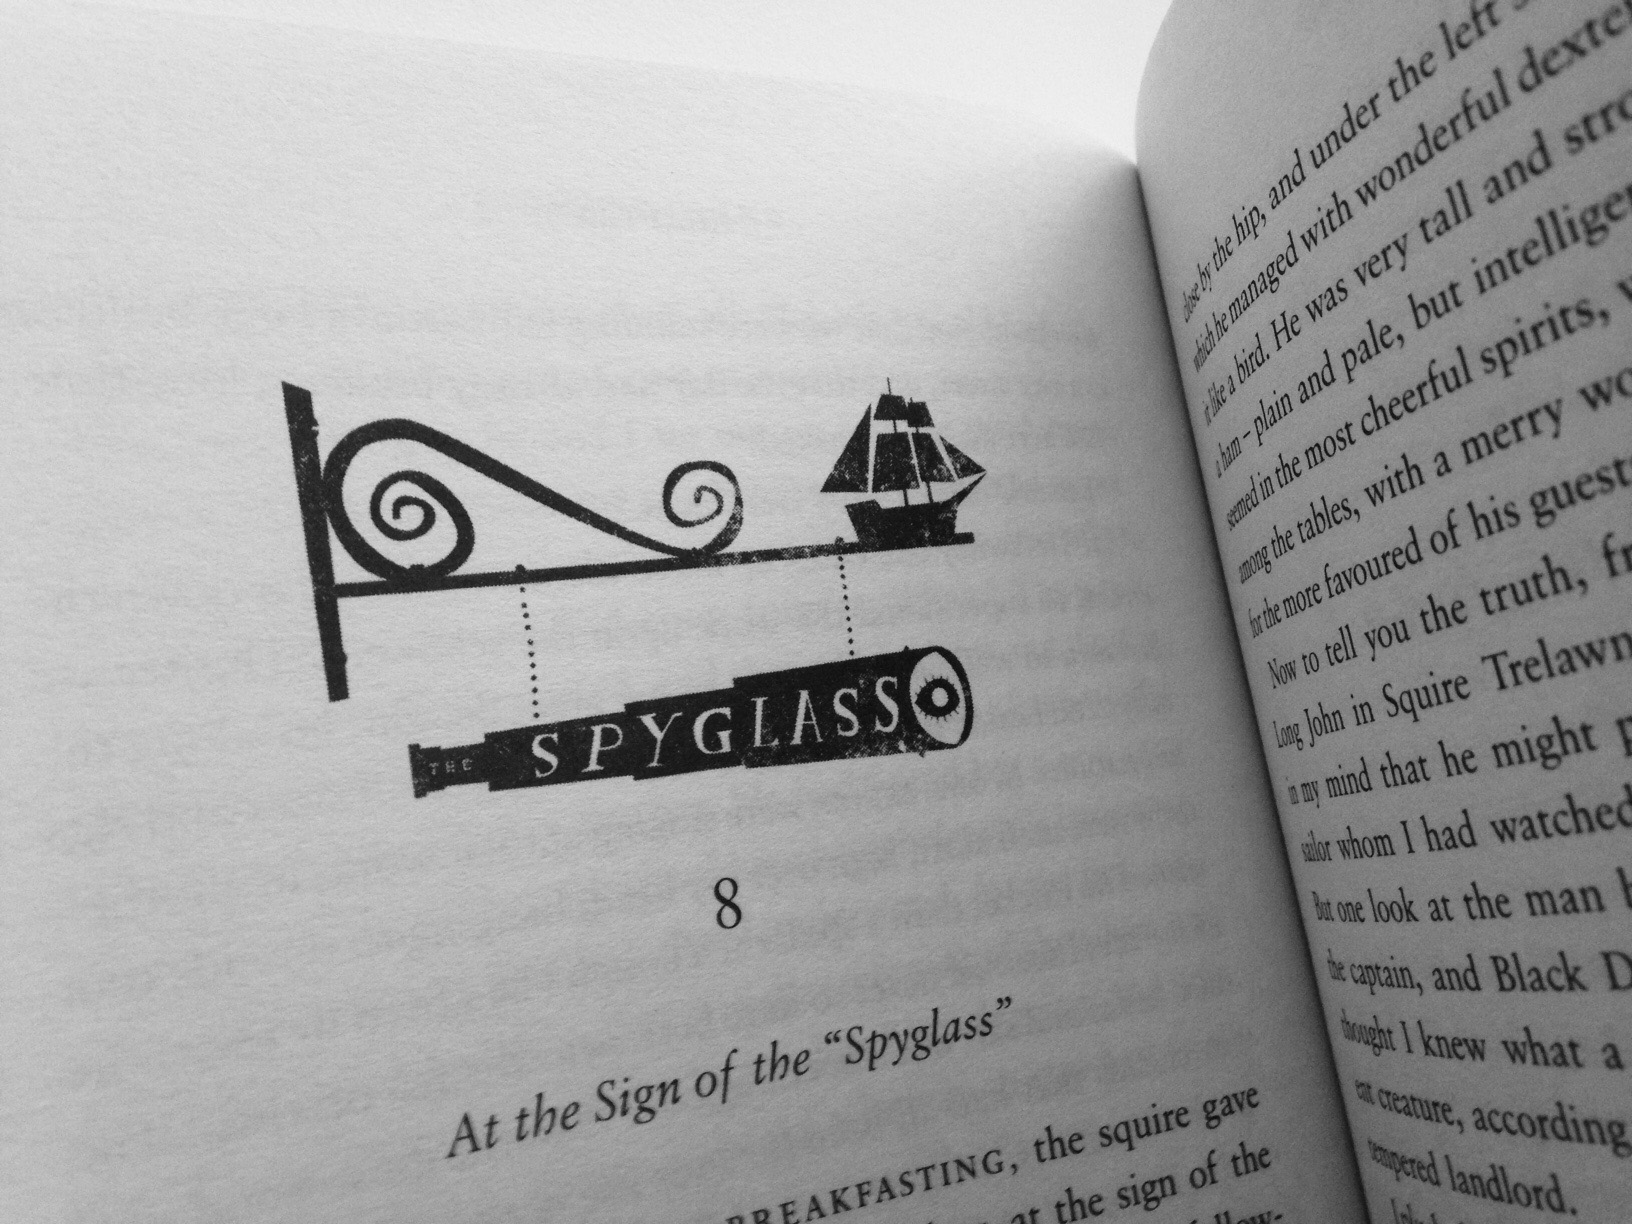 Treasure Island by RL Stevenson